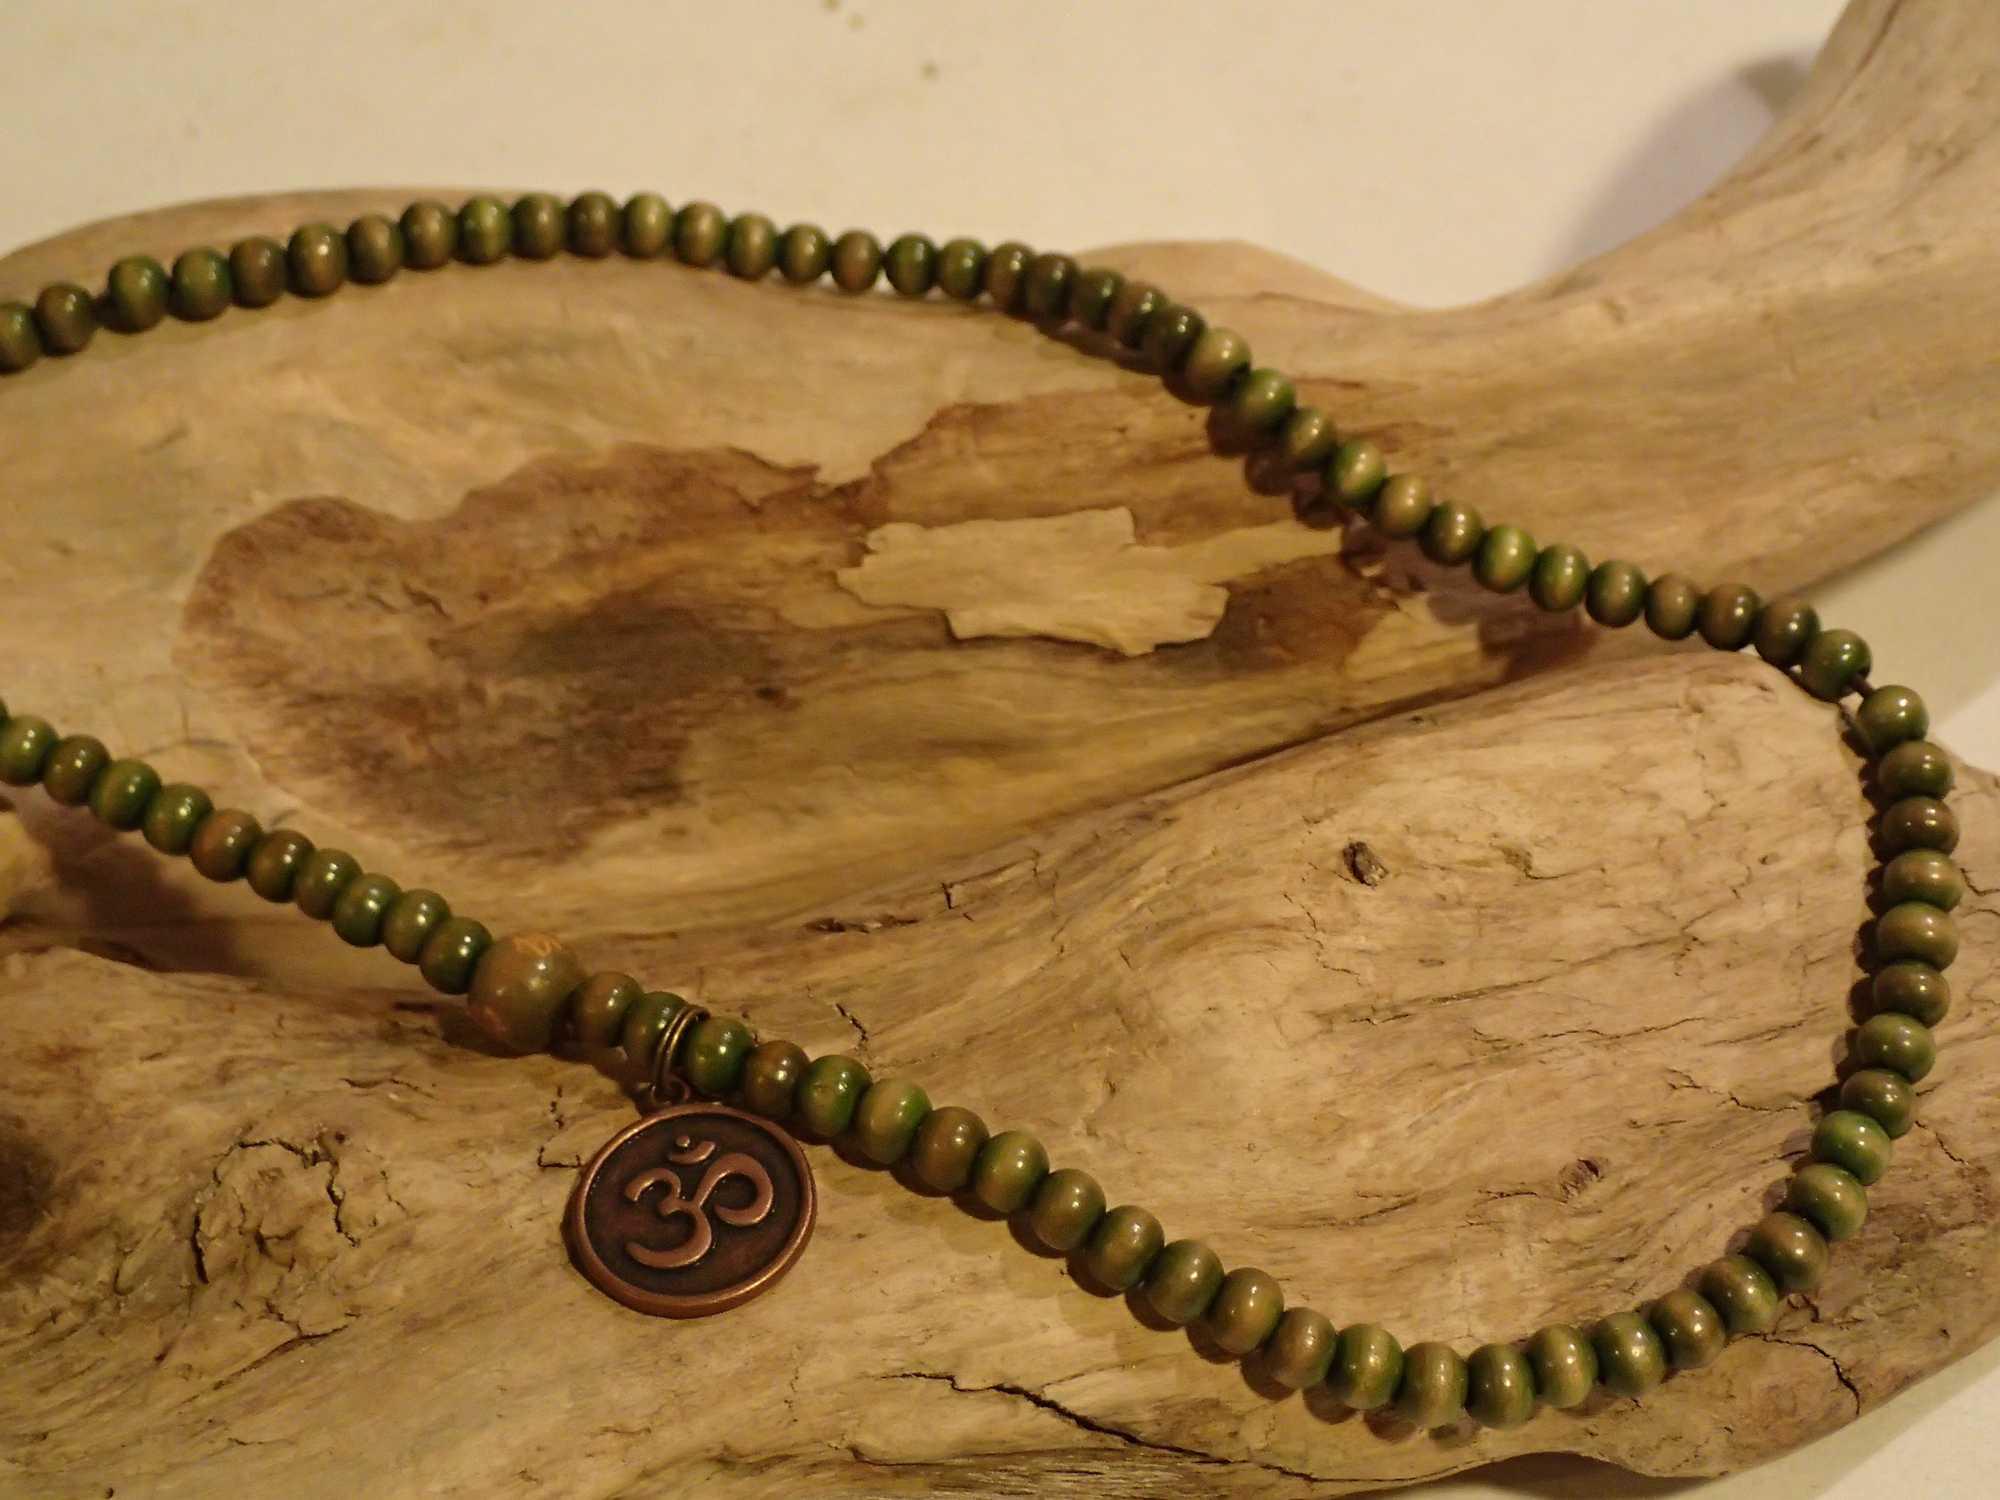 Atome-Crochu-_-product-_-collier-bracelet-mala-tibetain-en-bois-et-om-indien-03